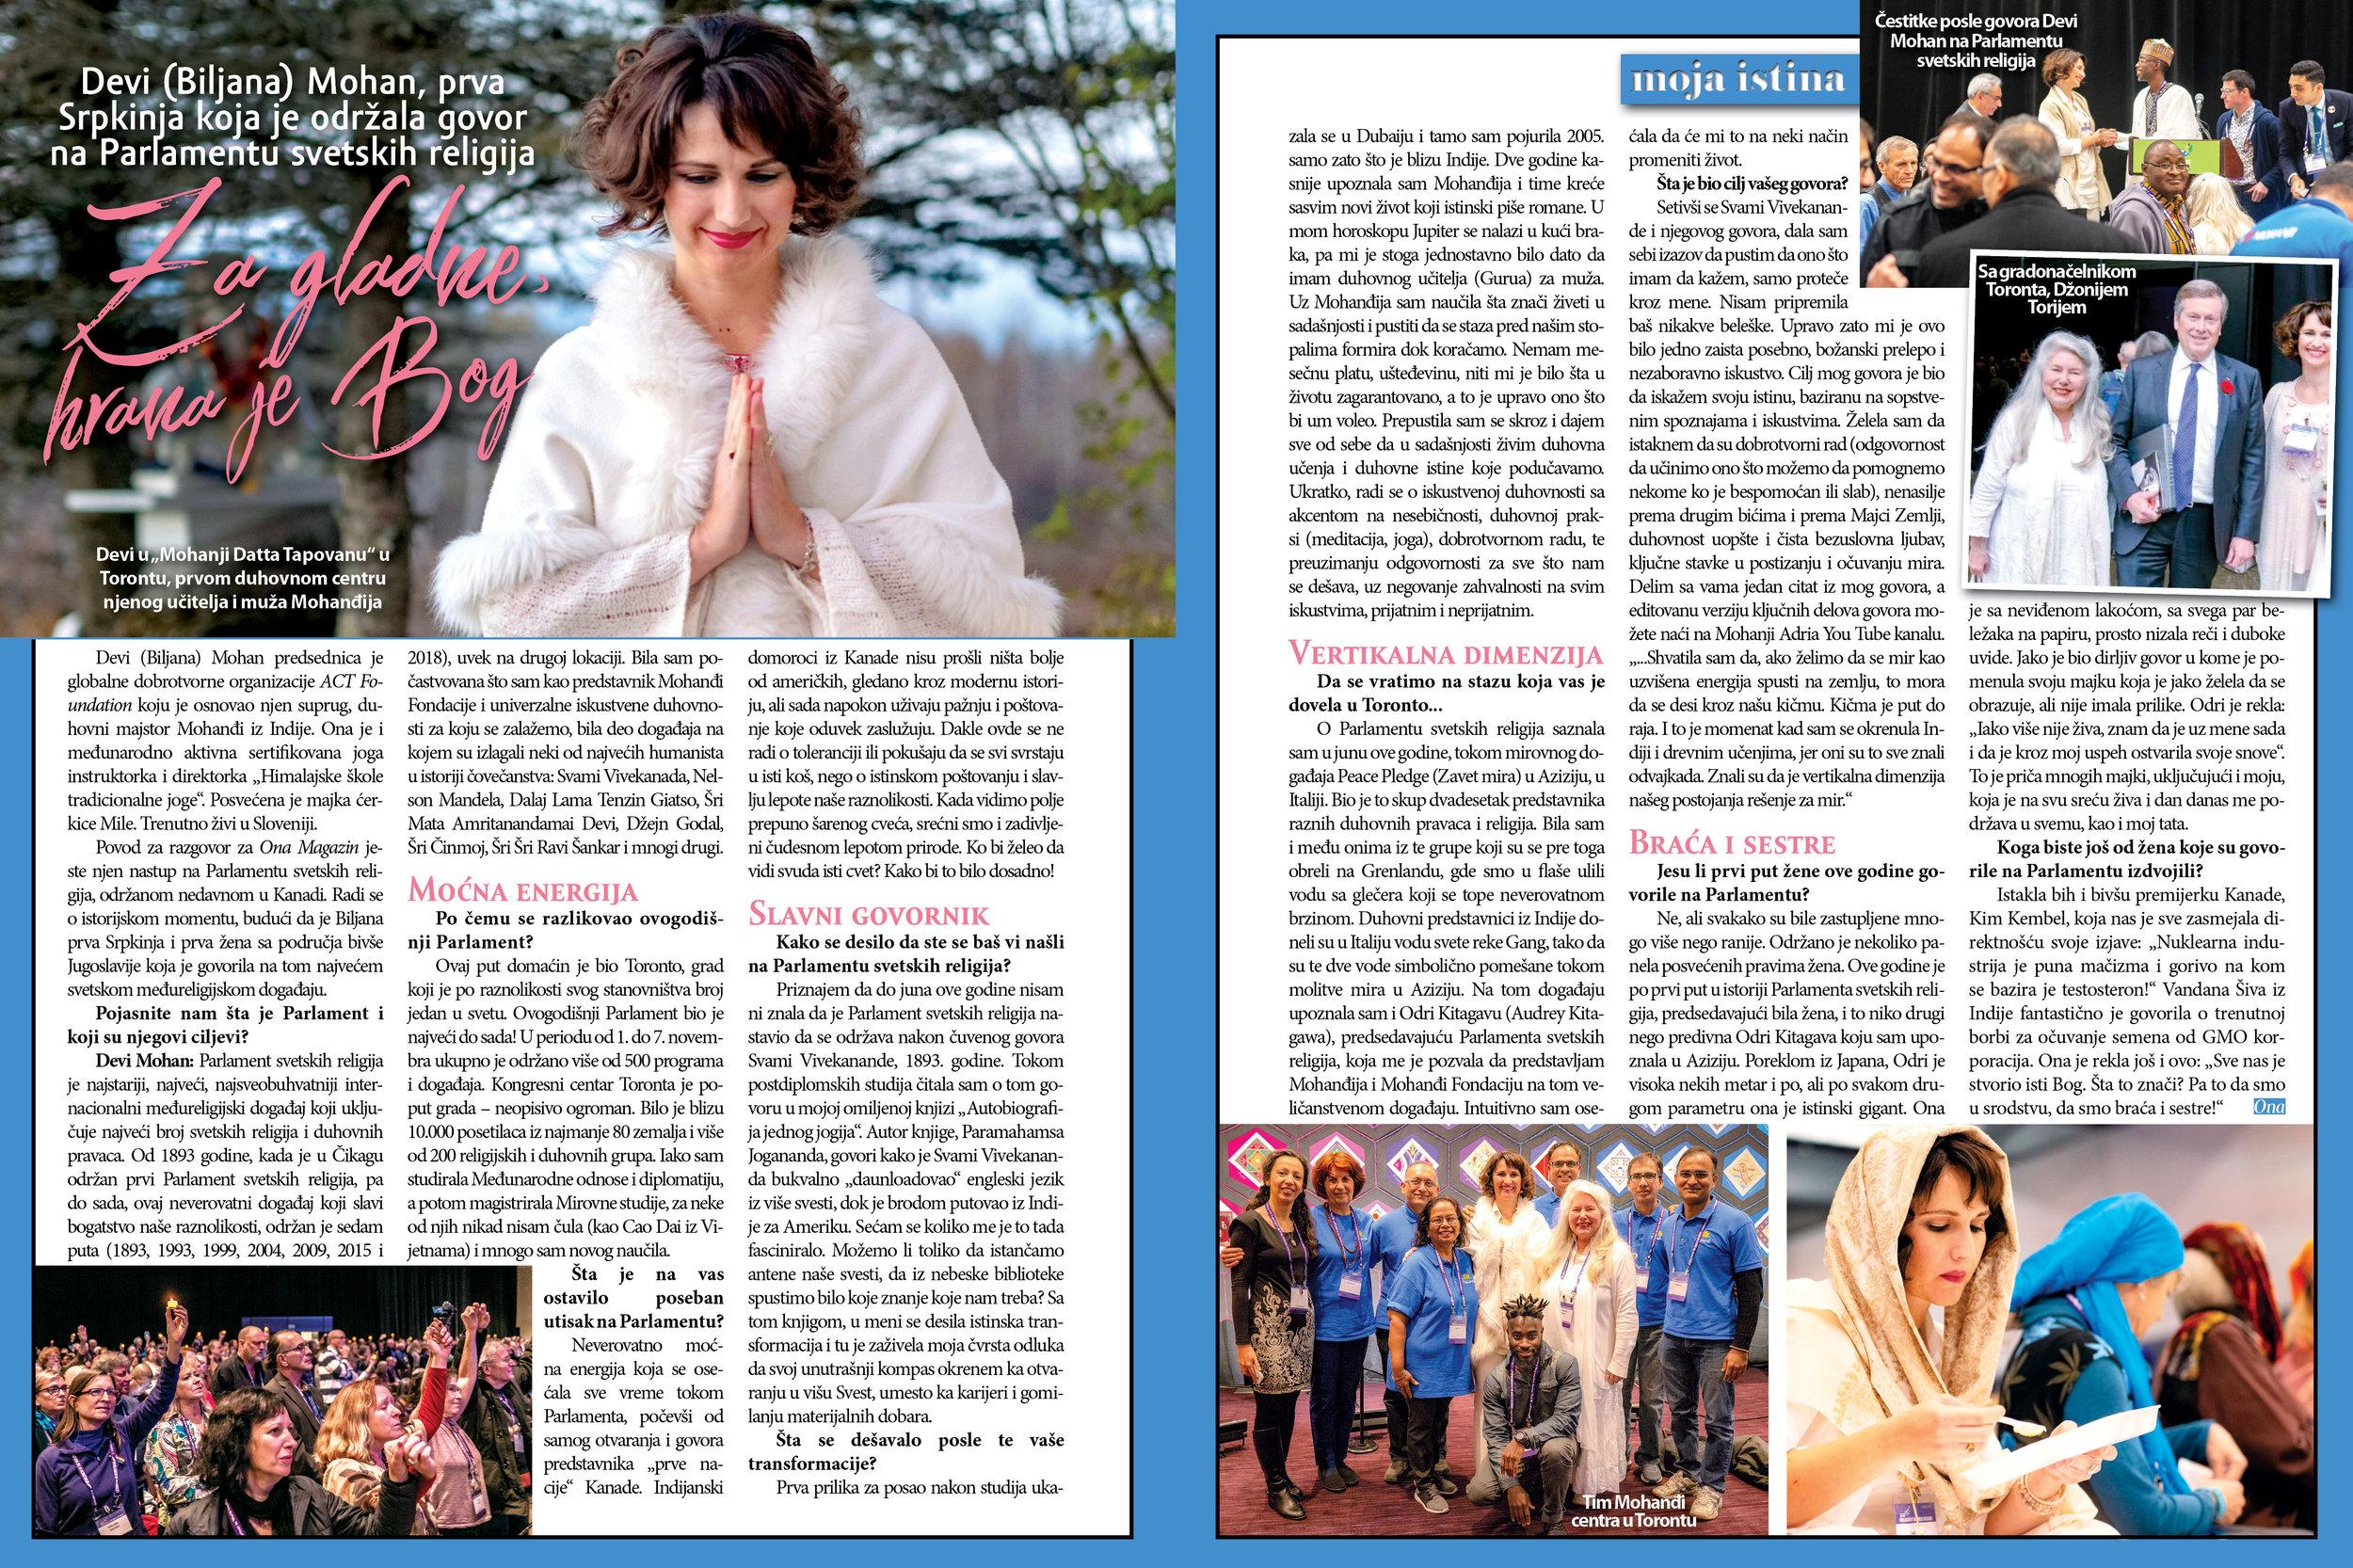 Devi Mohan Parliament Magazin Ona.jpg